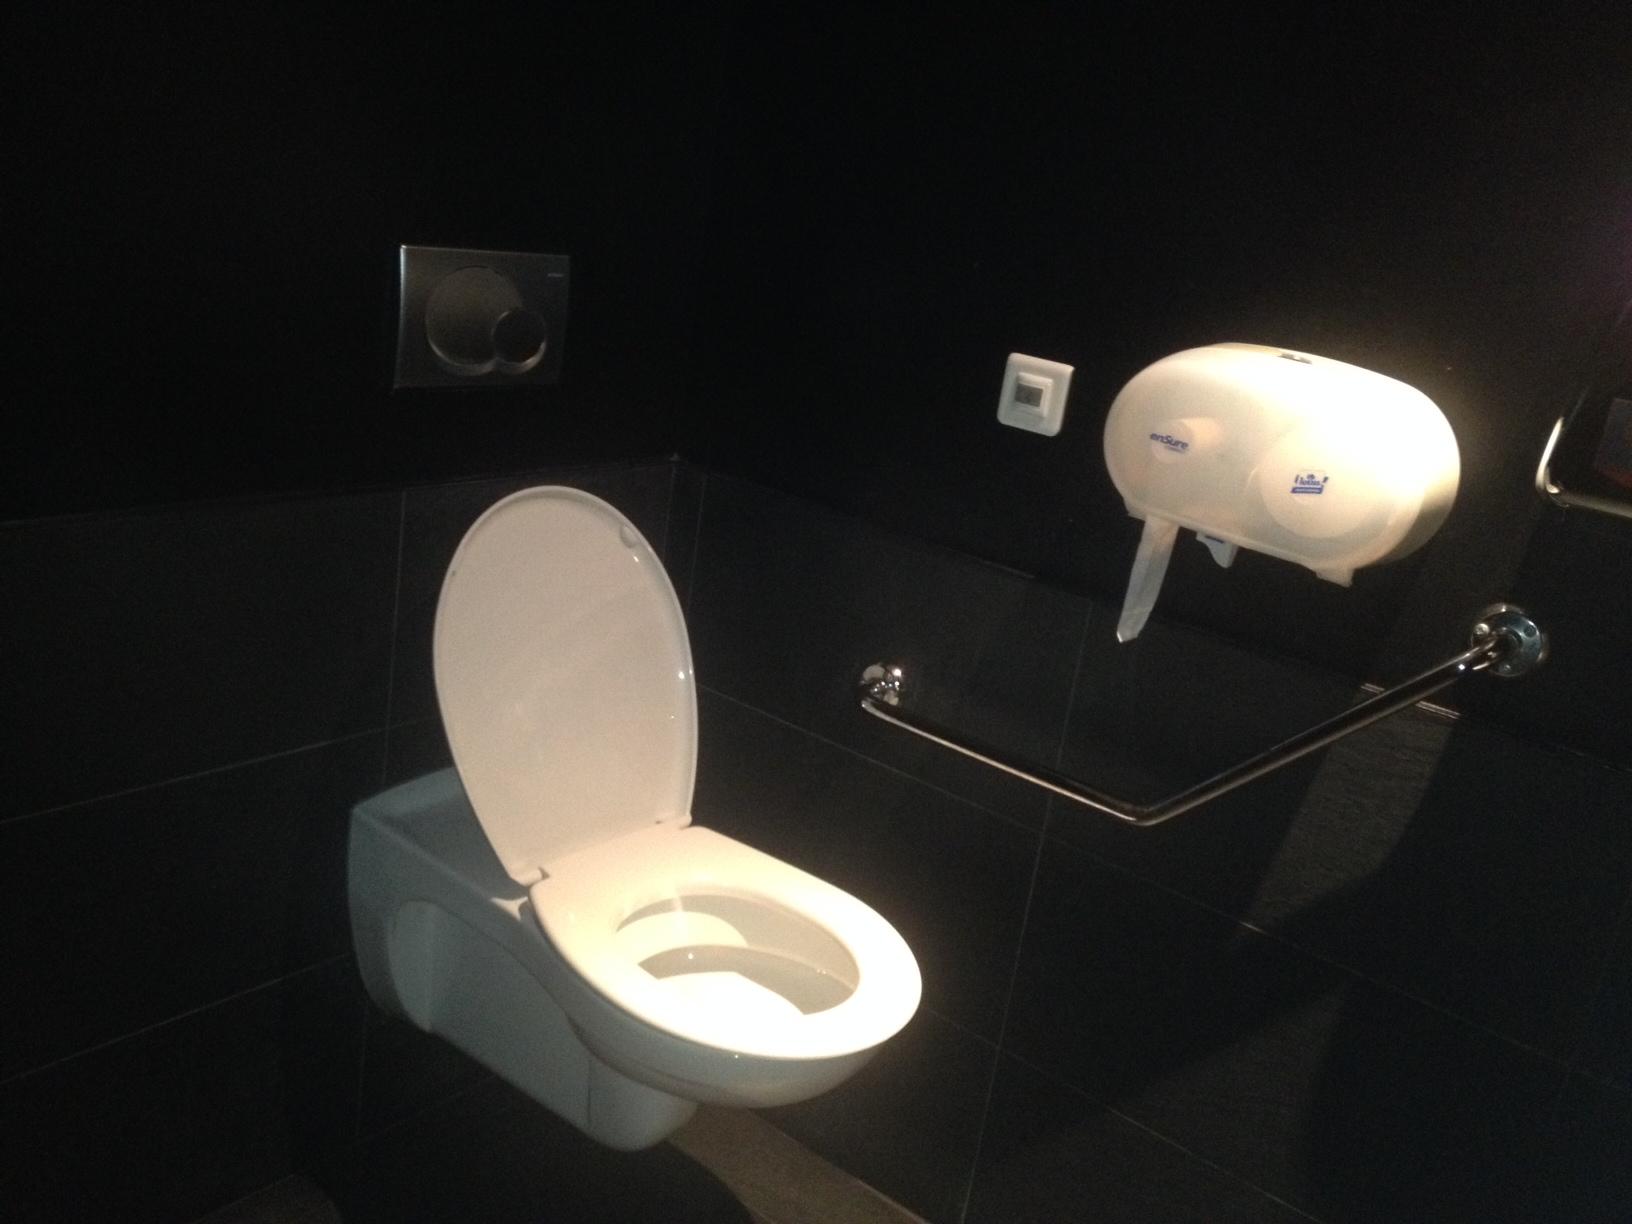 Architecture de toilettes